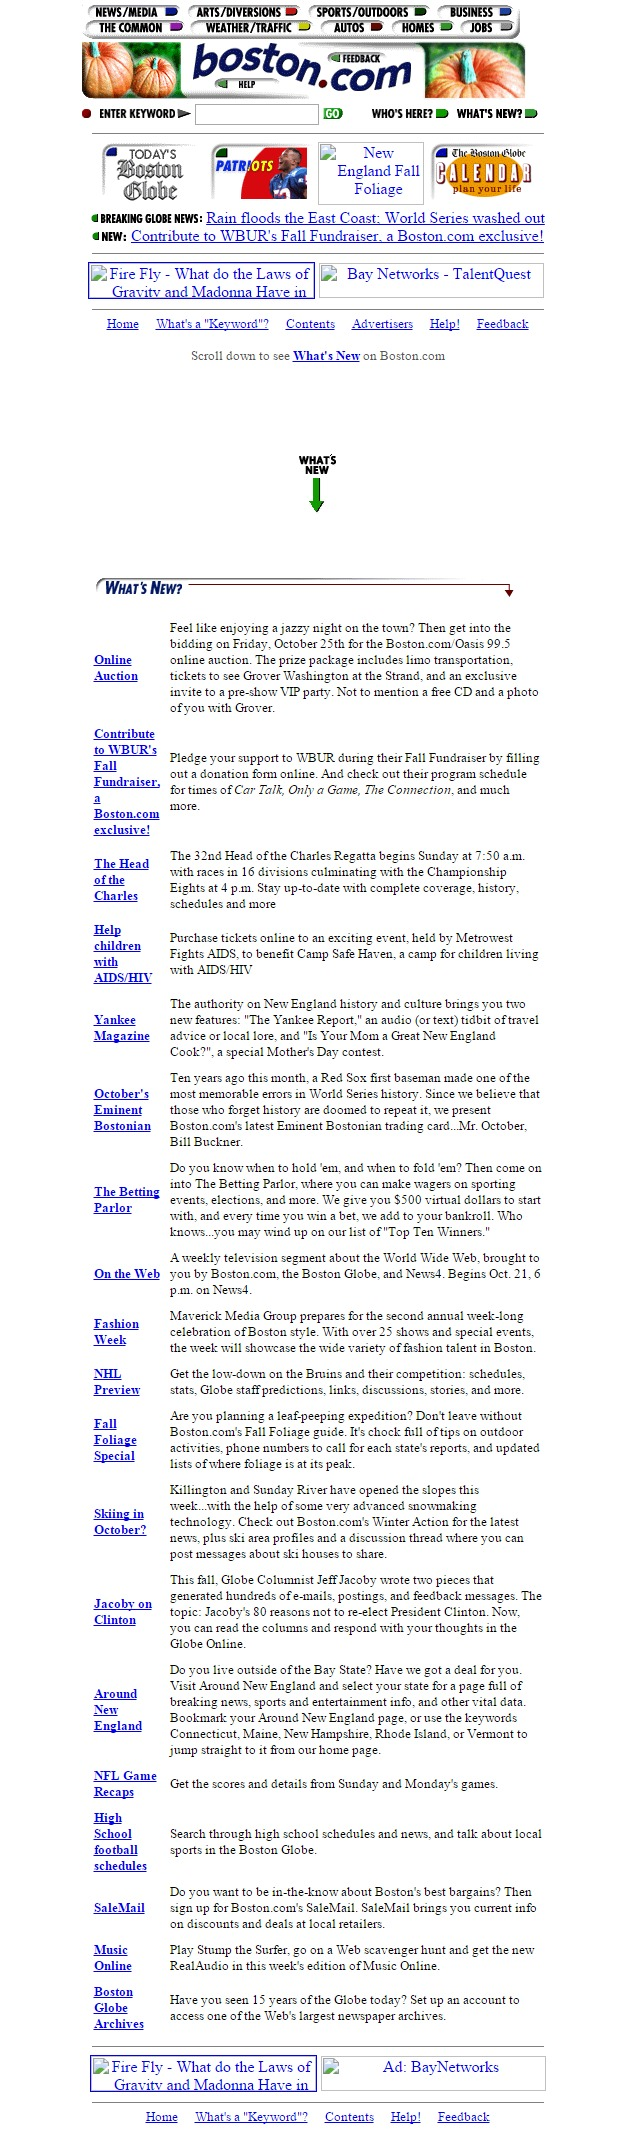 boston.com 1996